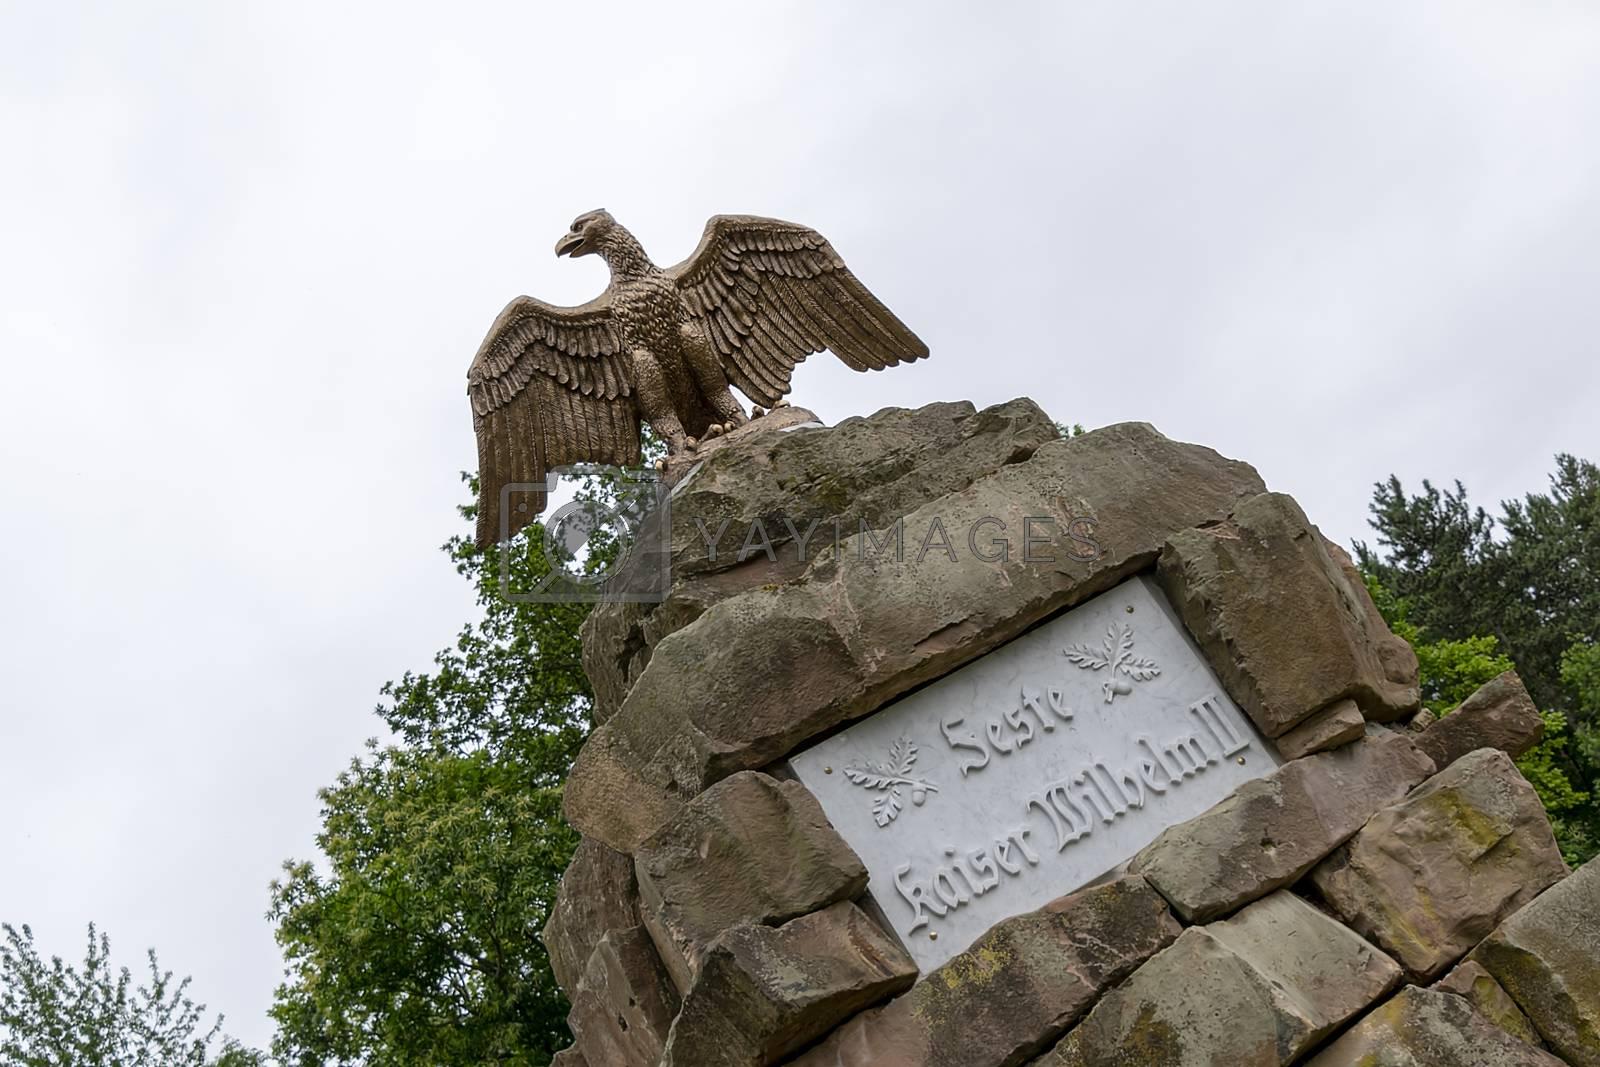 """Namensstein"" at the entrance of the Feste"